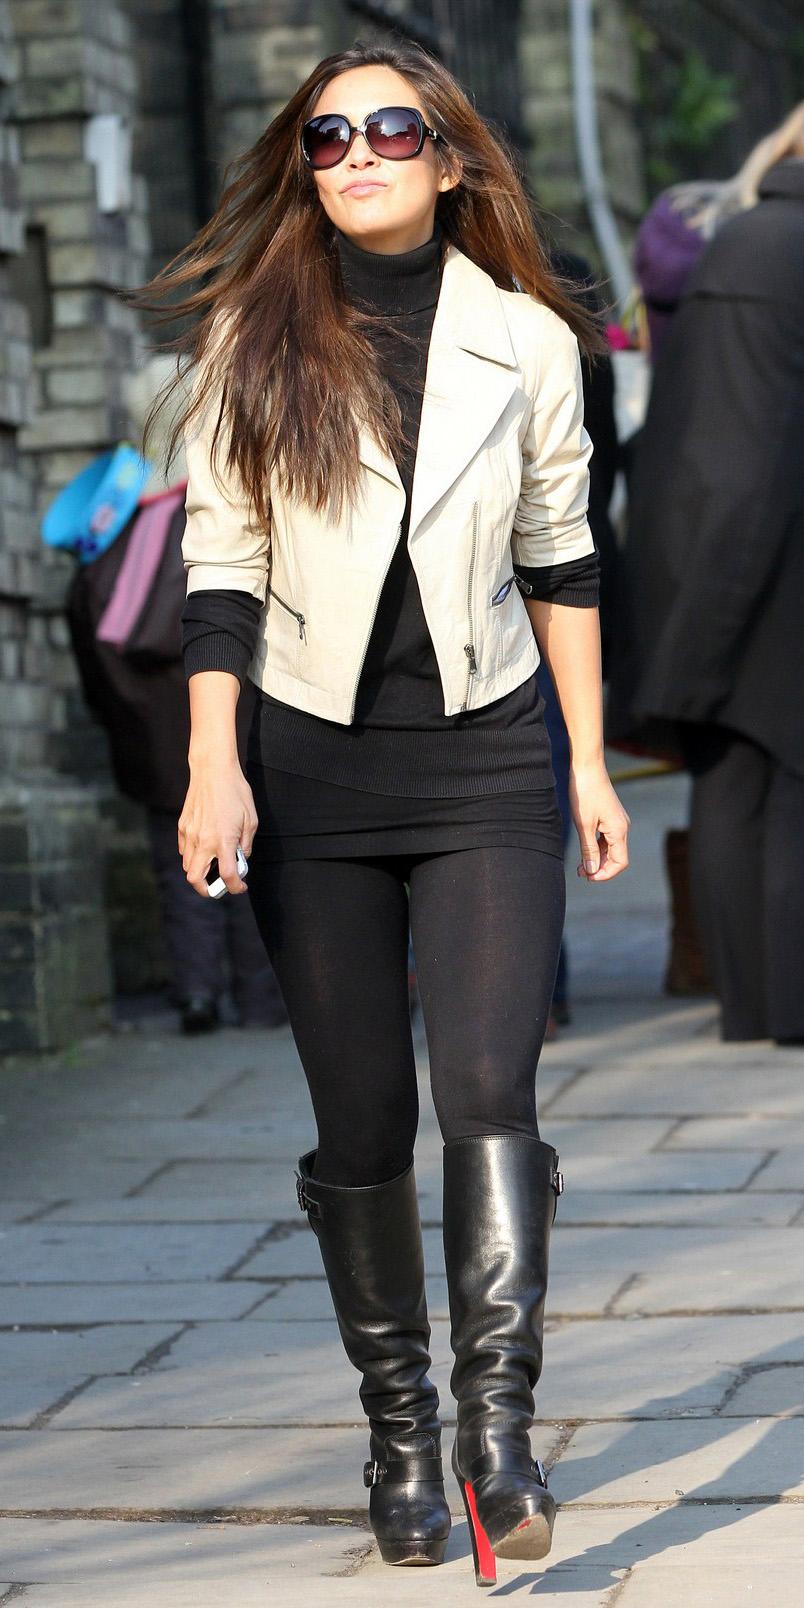 black-leggings-black-sweater-white-jacket-crop-sun-myleeneklass-wear-outfit-fashion-fall-winter-black-shoe-boots-brun-lunch.jpg